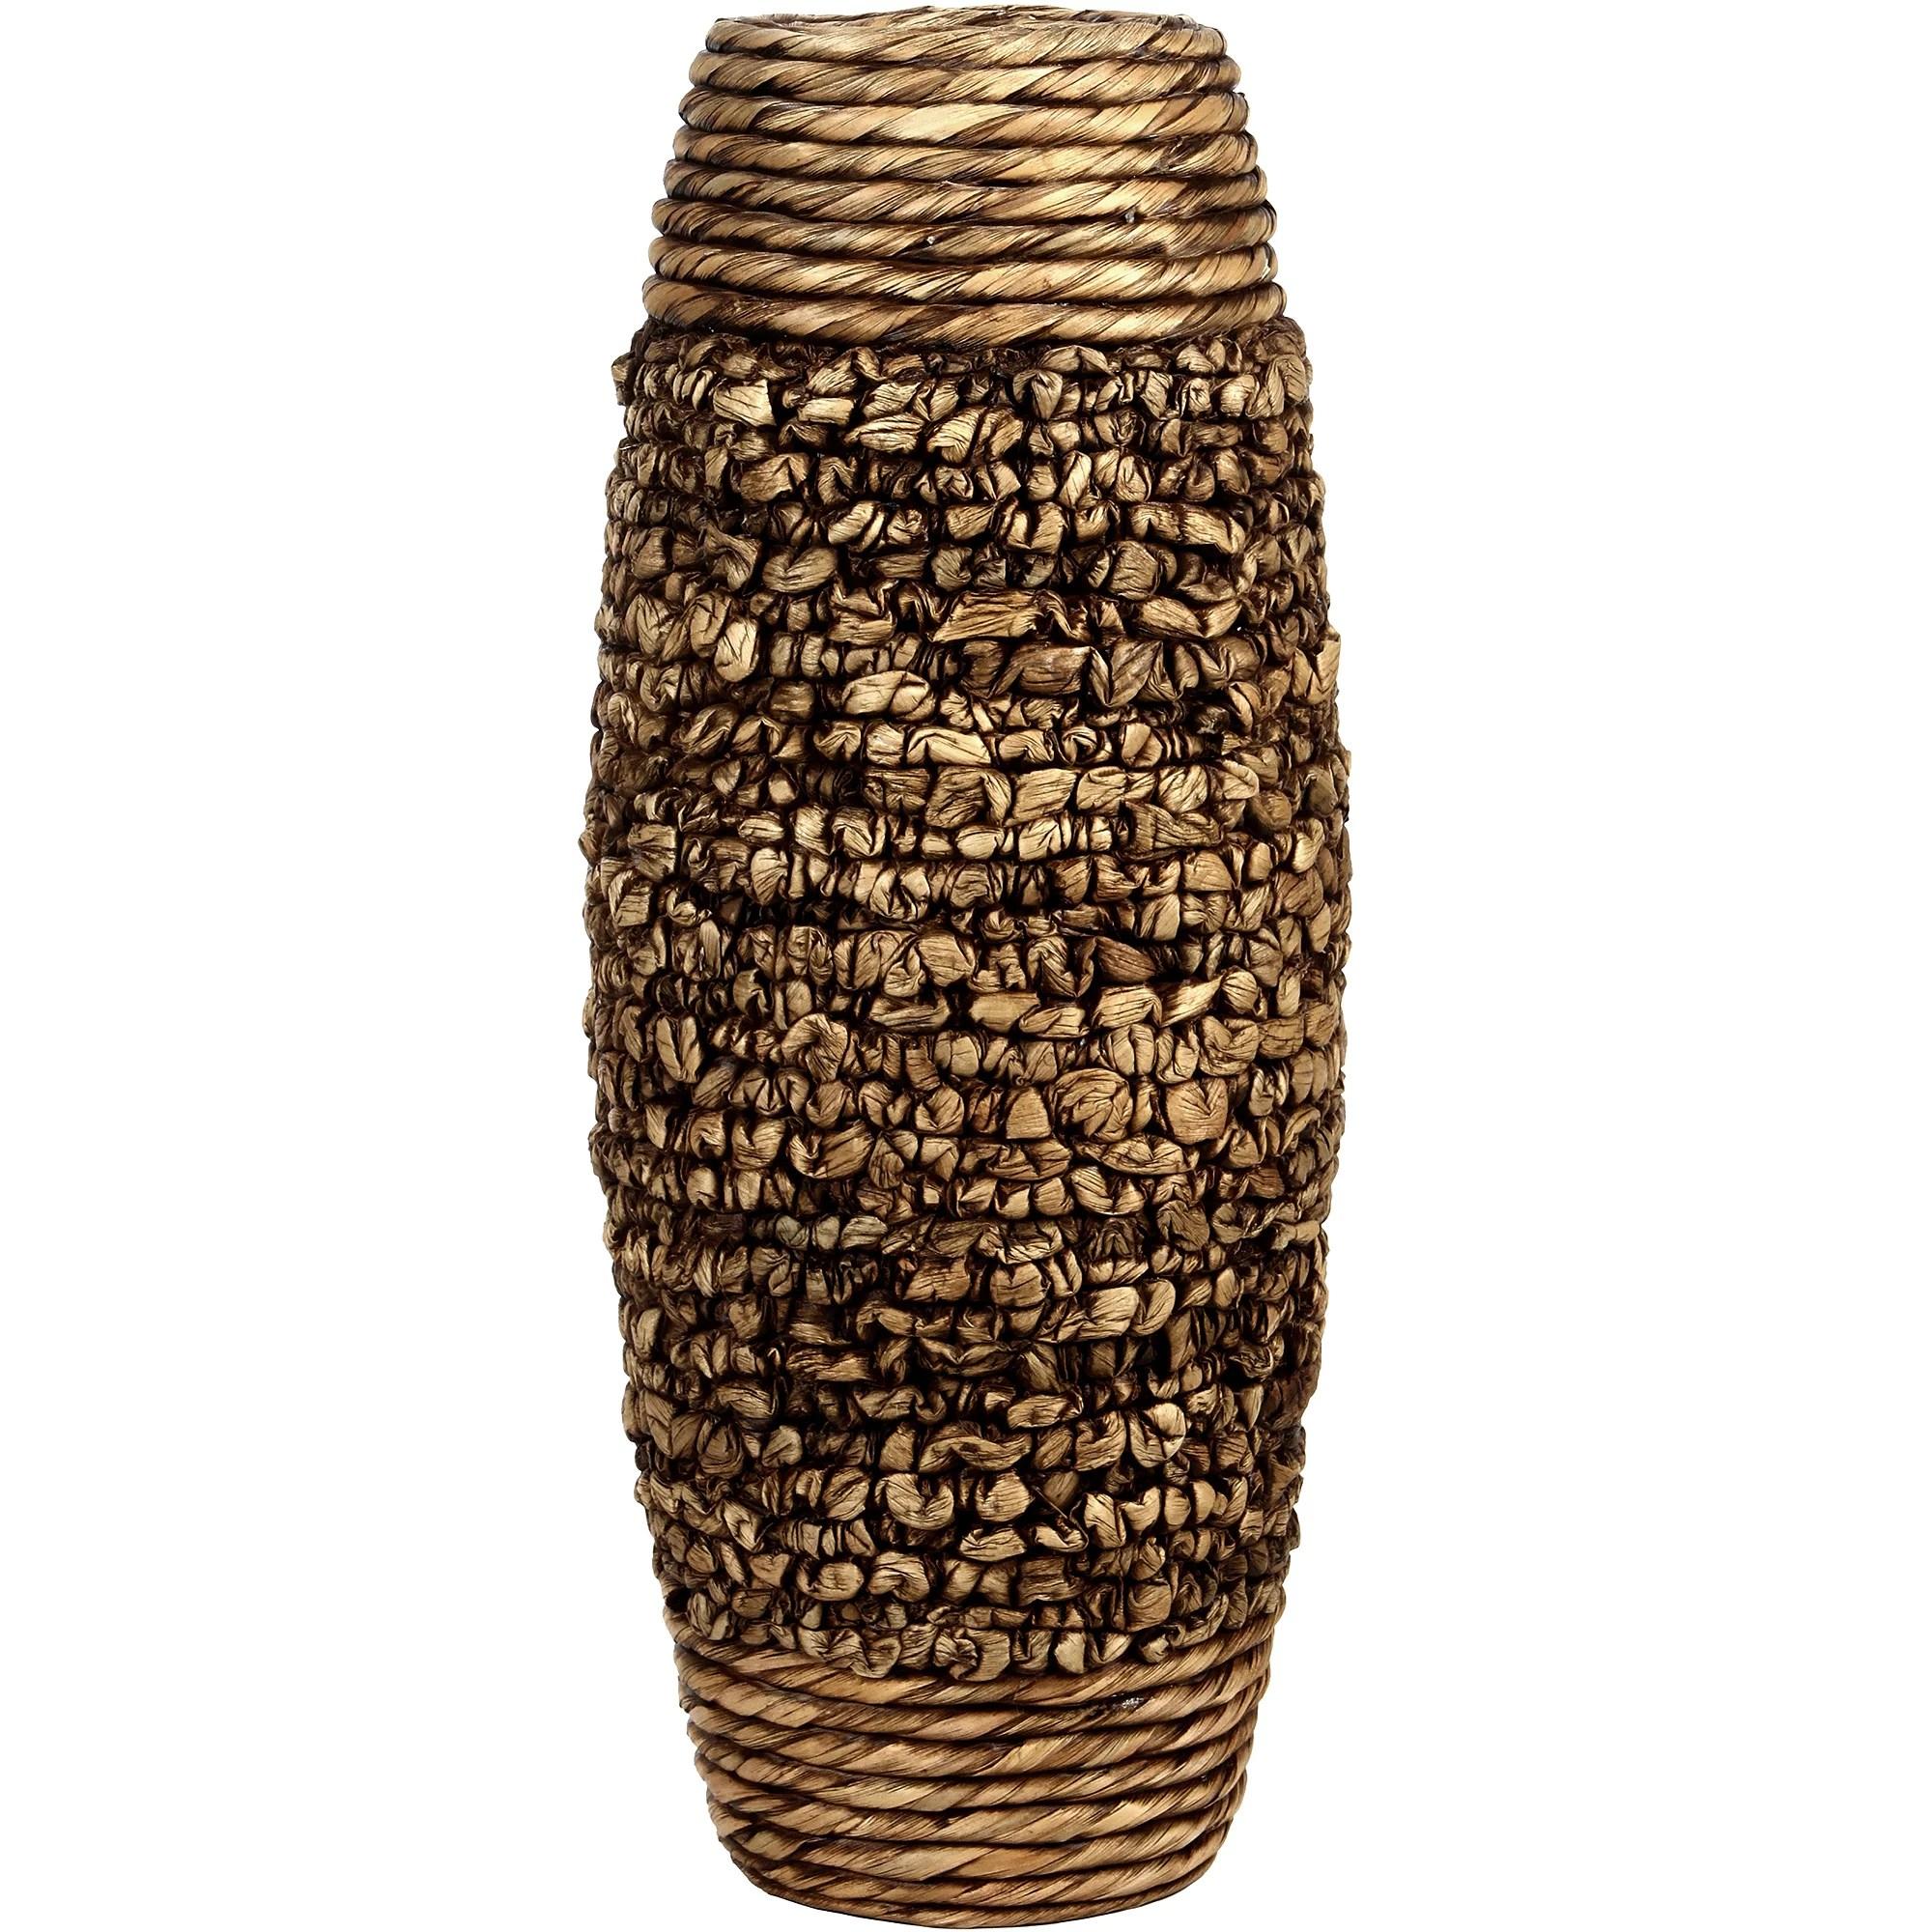 Home Decor Big Tall Floor Hosley Brown Water Hyacinth Vase